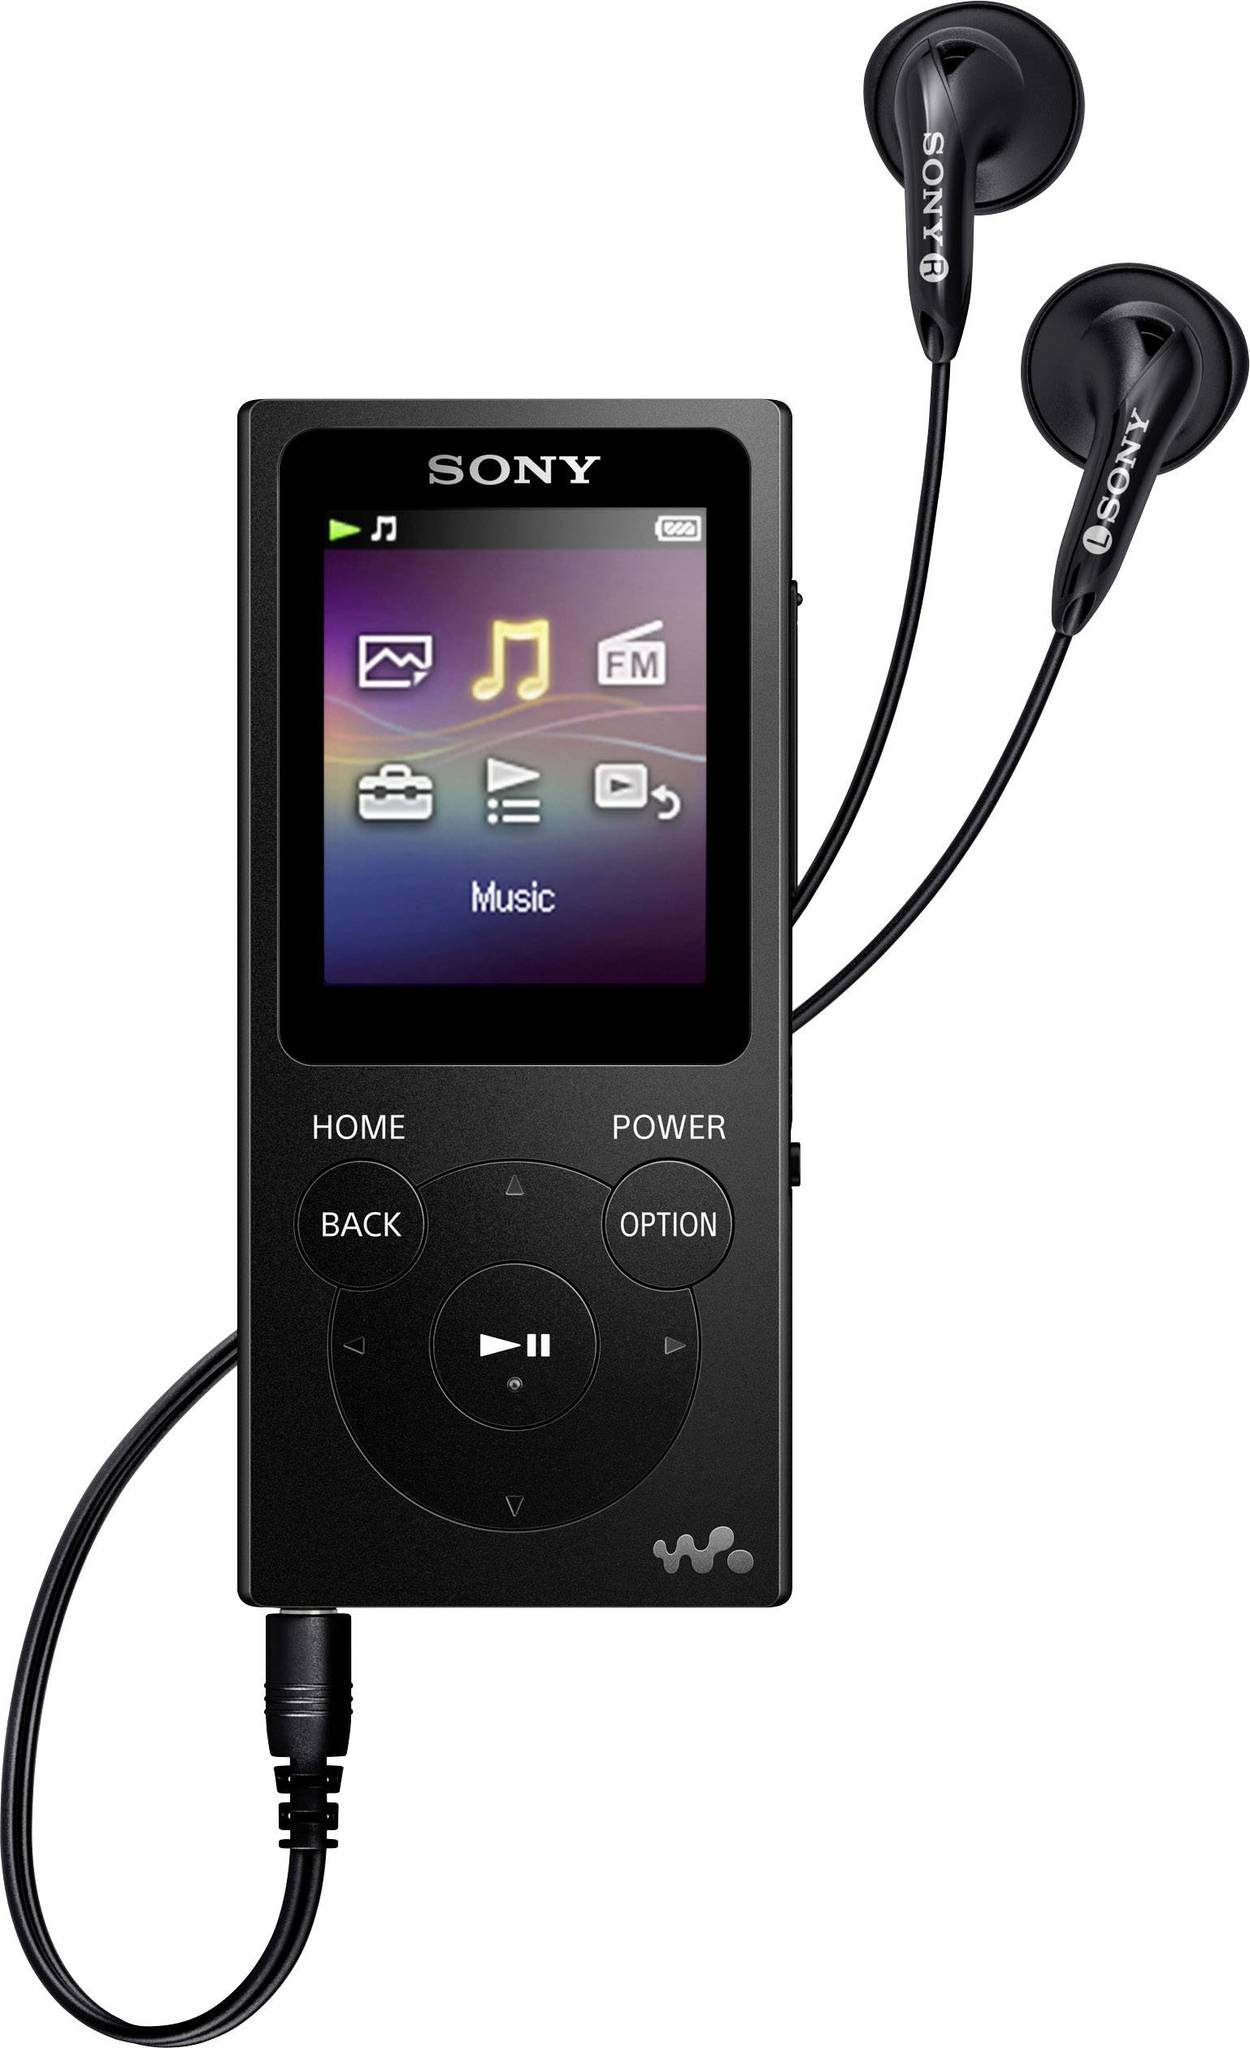 NW-E394B MP3 плеер Sony Walkman, черный